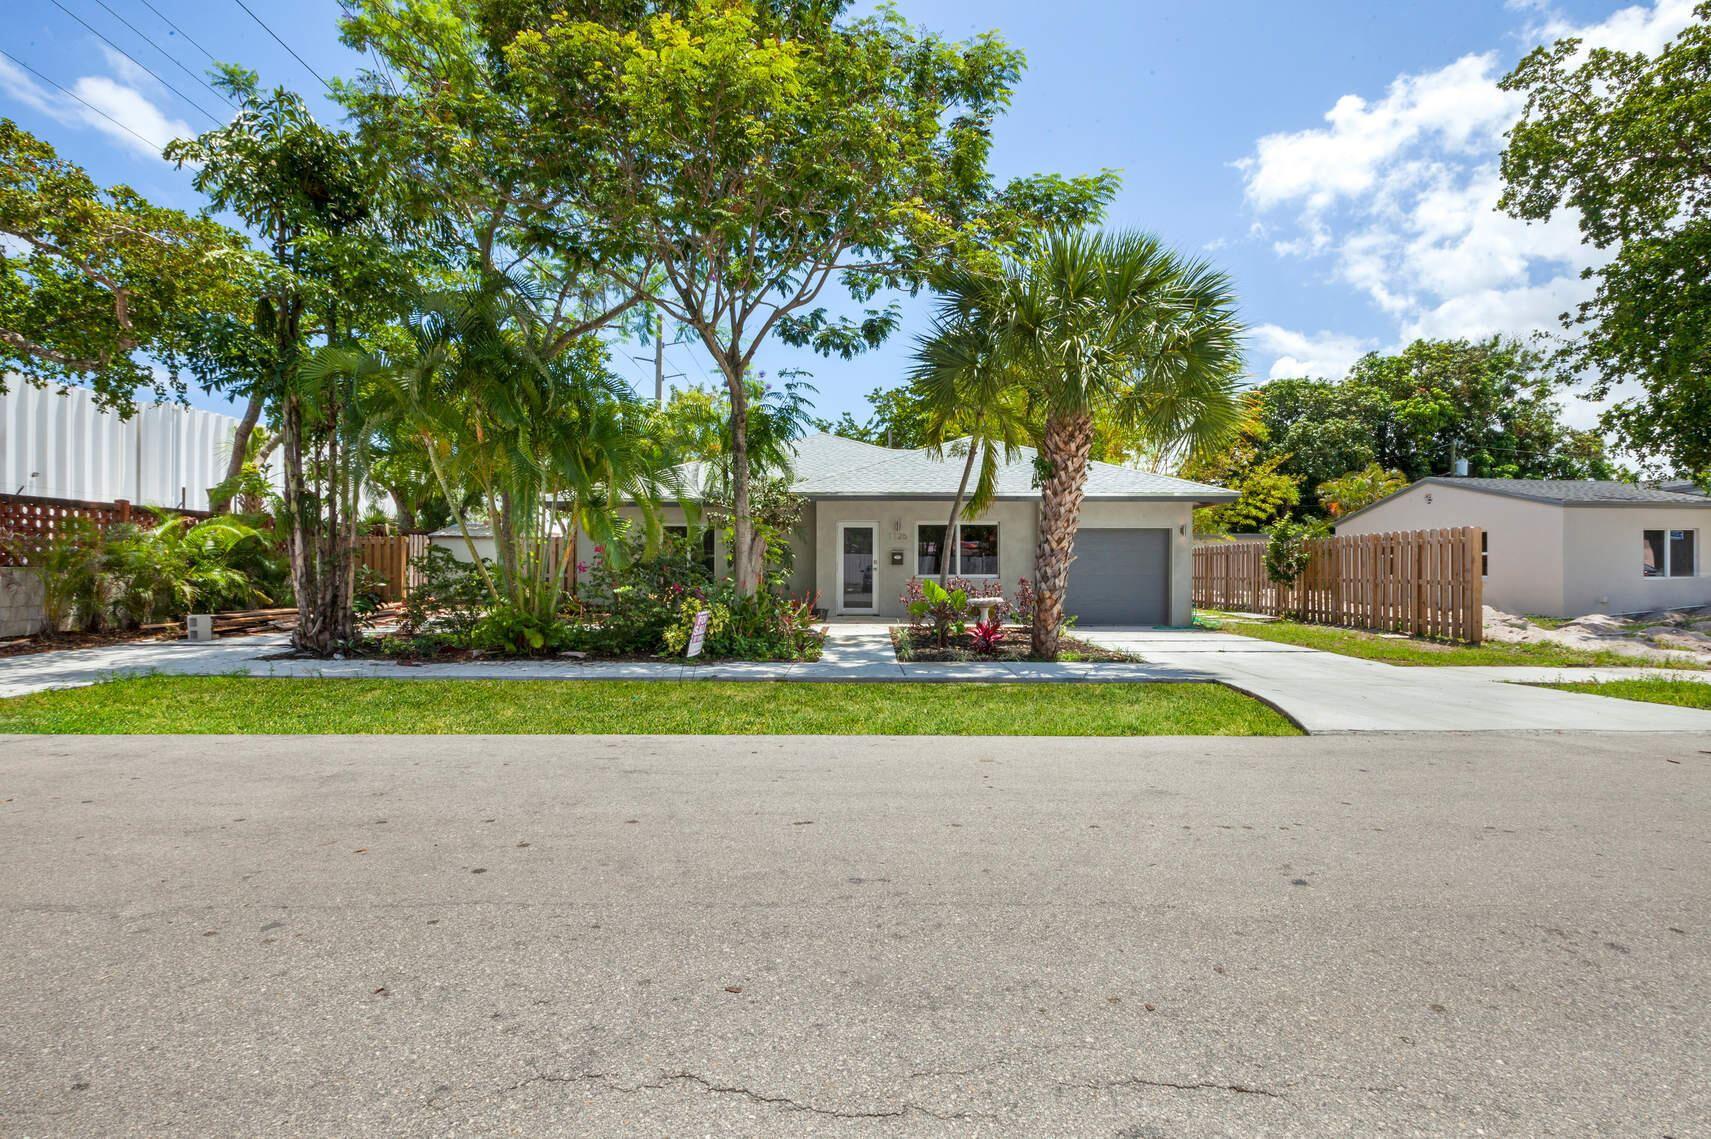 Photo of 1126 NE 16th Court, Fort Lauderdale, FL 33305 (MLS # RX-10742674)